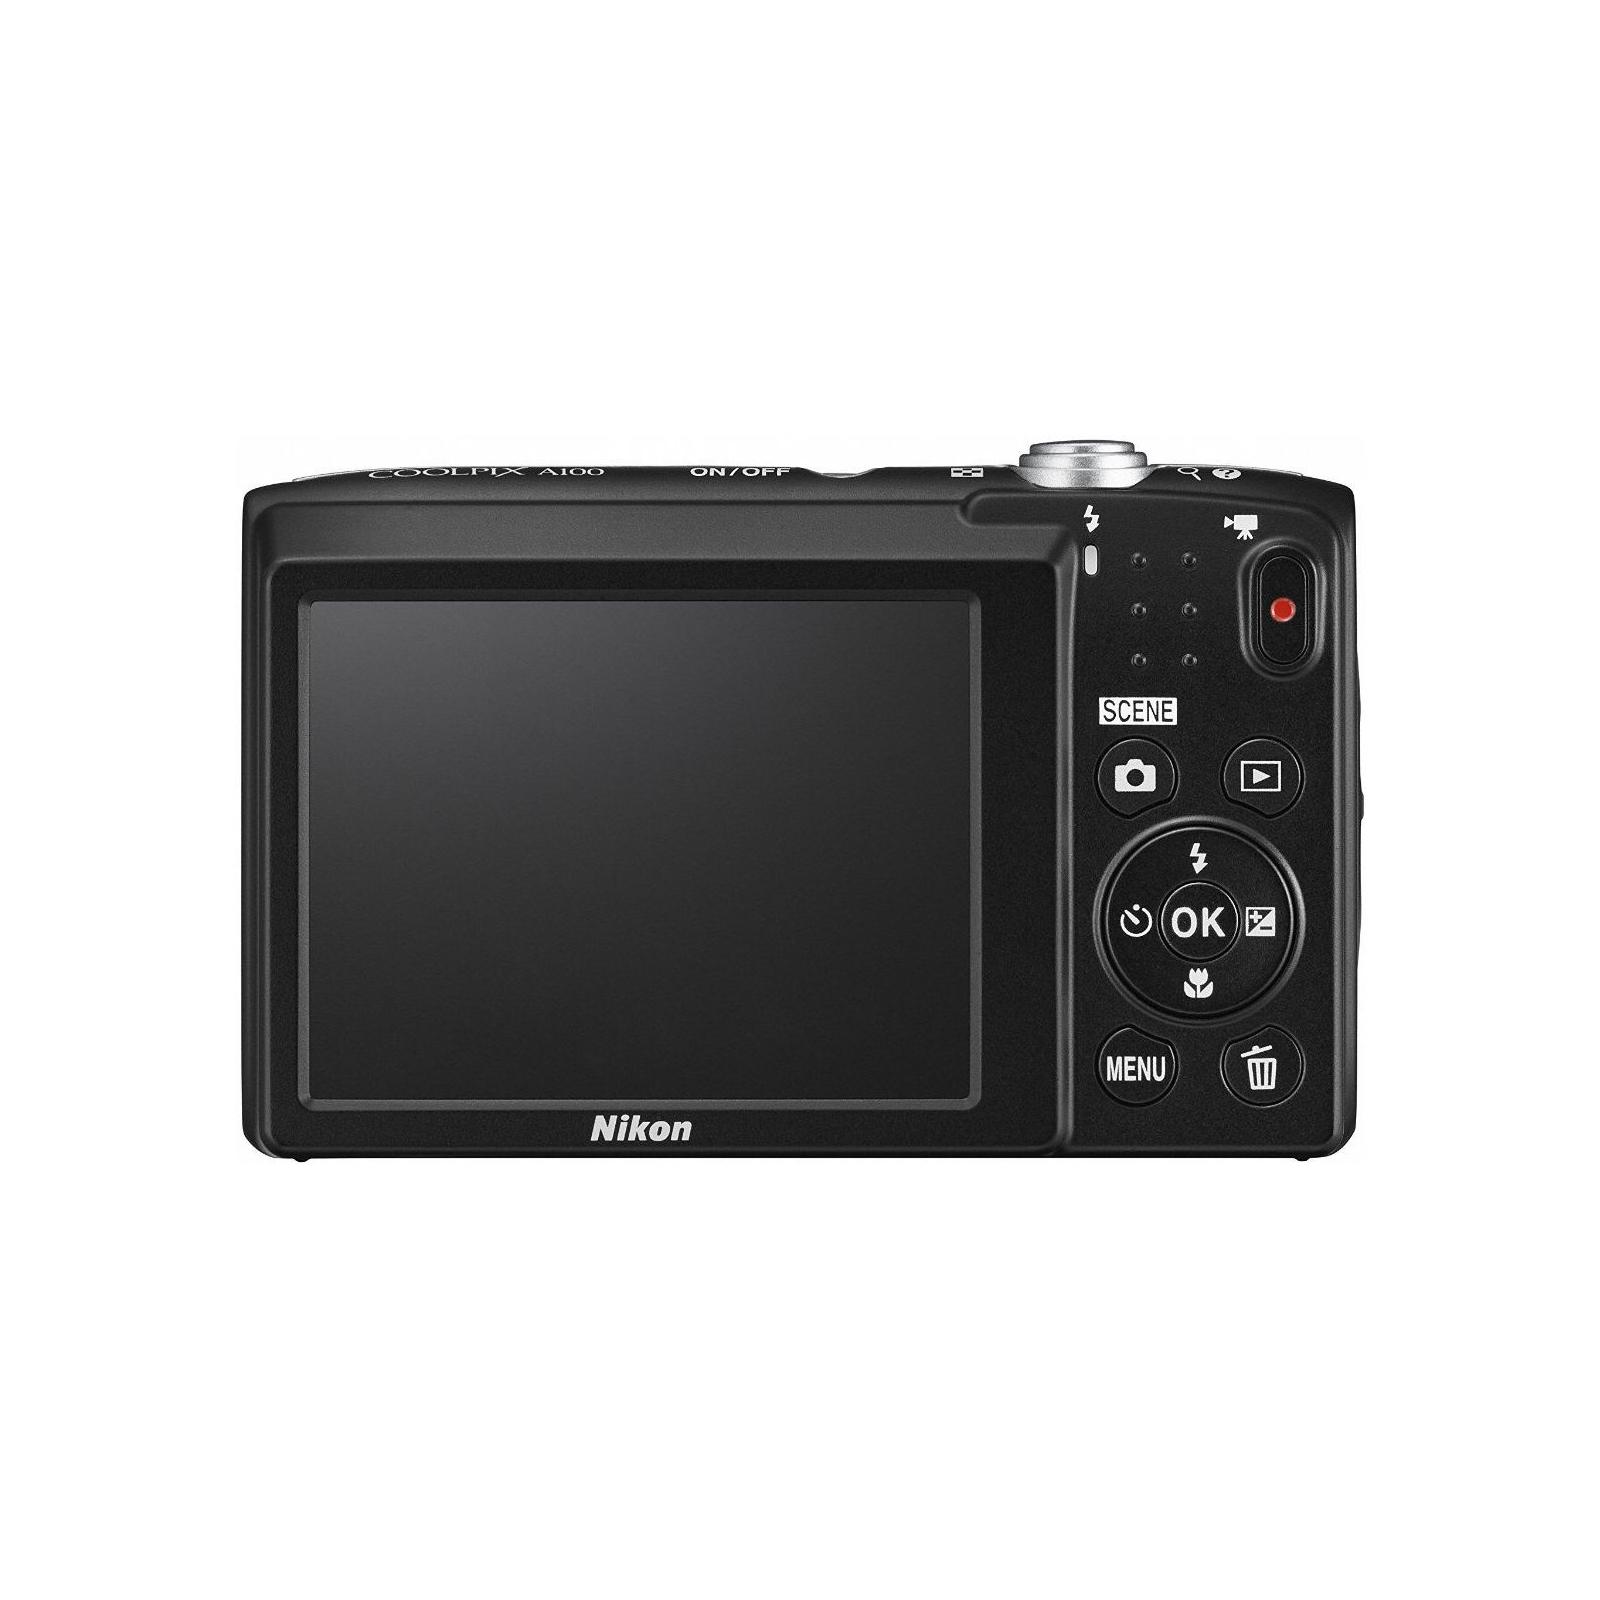 Цифровой фотоаппарат Nikon Coolpix A100 Silver (VNA970E1) изображение 3